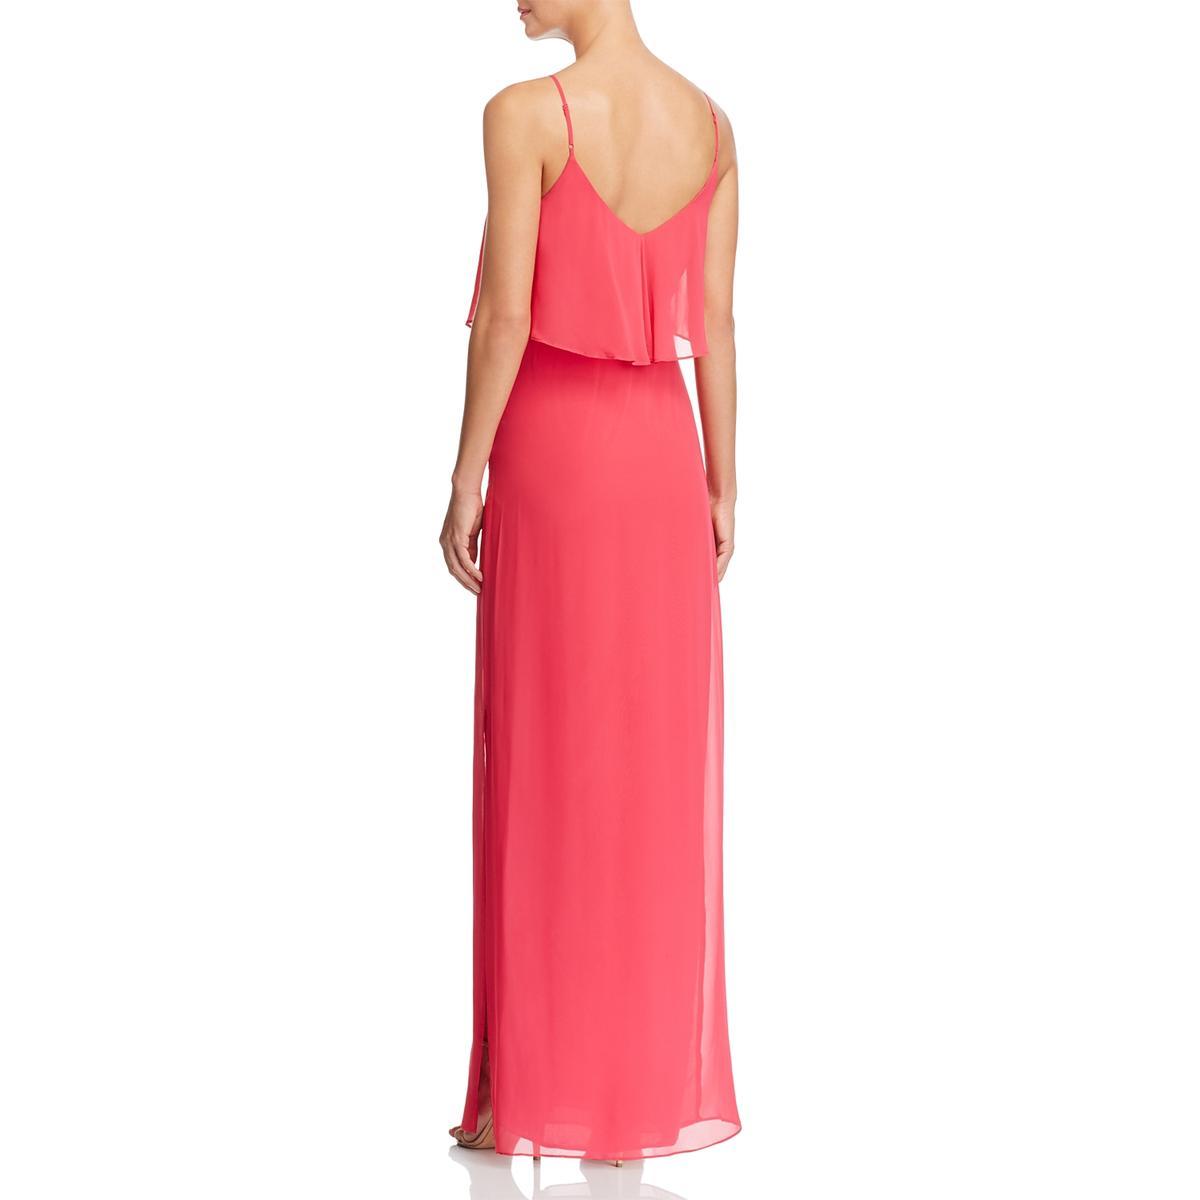 Laundry by Shelli Segal Womens Maxi Maxi Maxi Evening Ruffled Evening Dress Gown BHFO 0108 7fd869